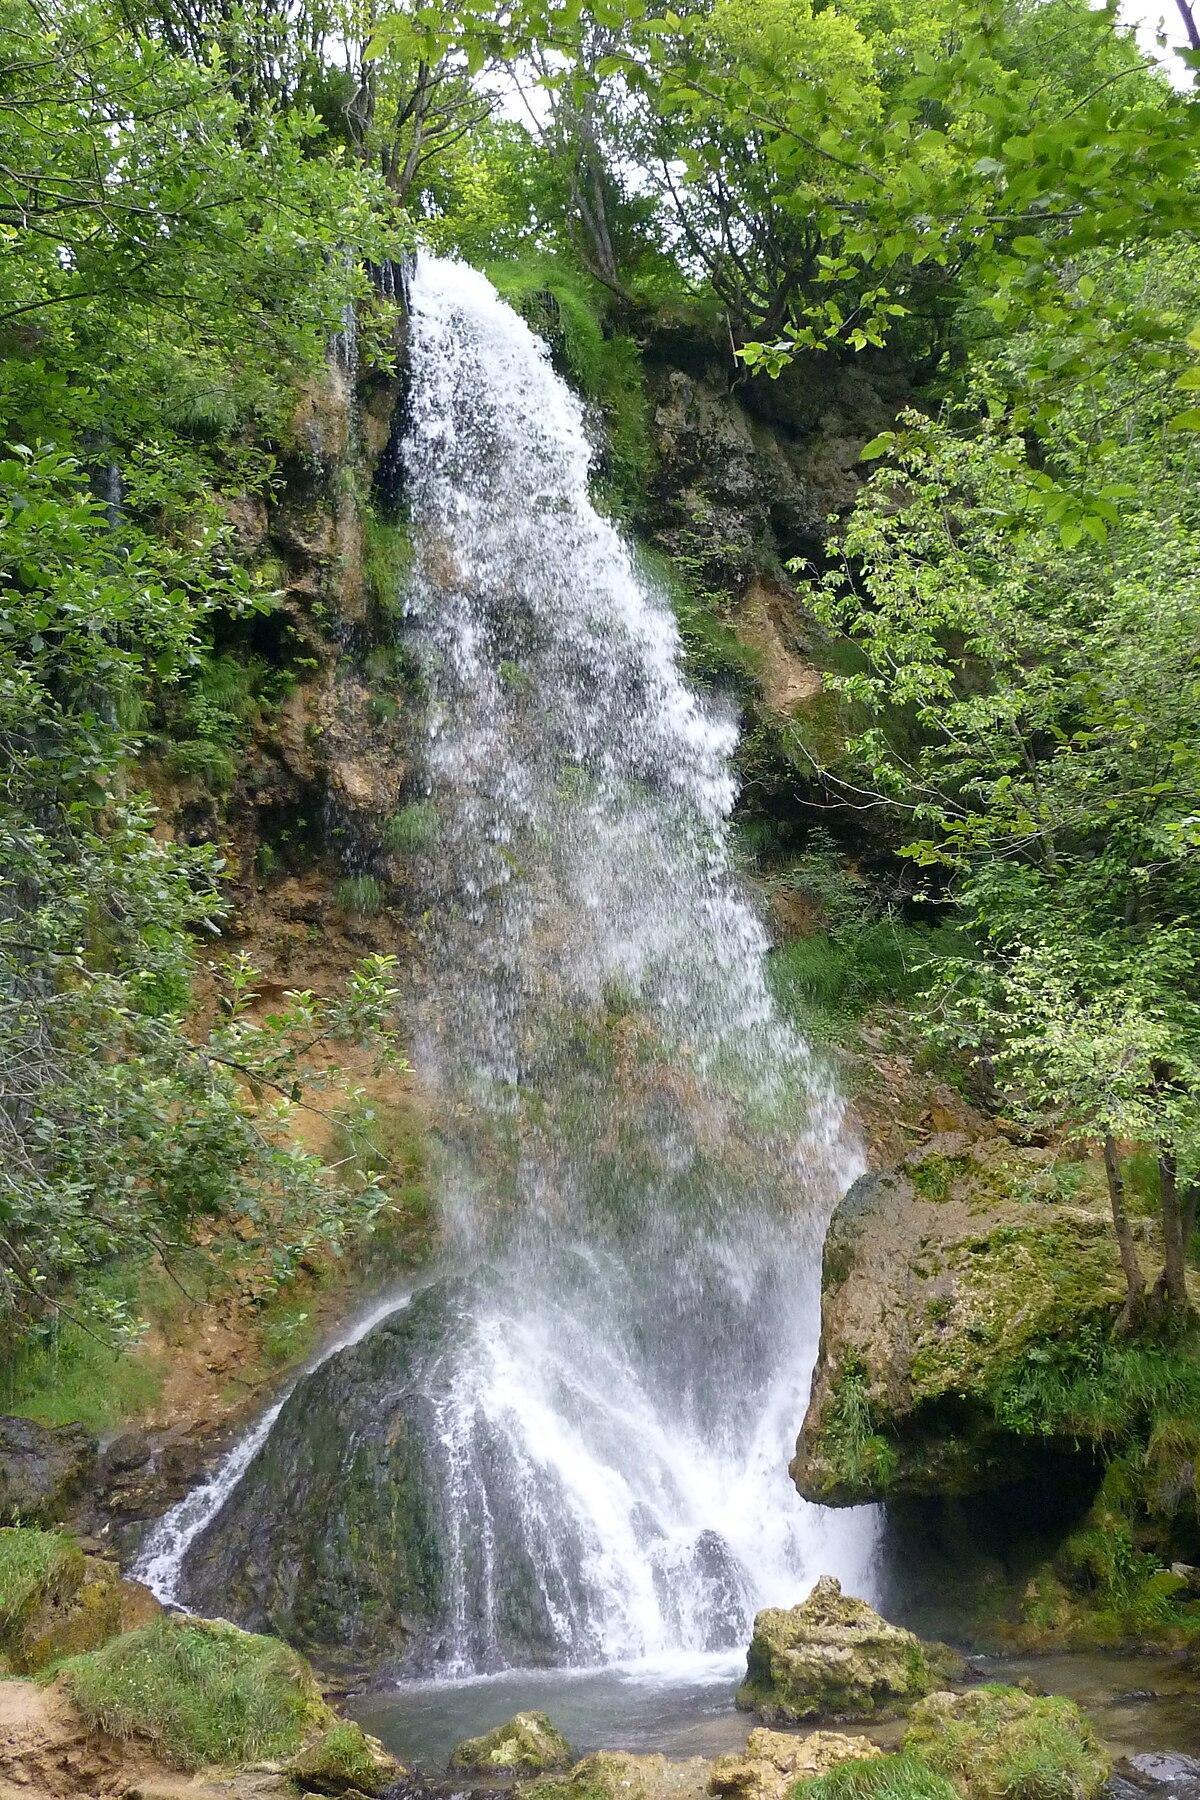 Vodopad u Gostilju — Vikipedija, slobodna enciklopedija